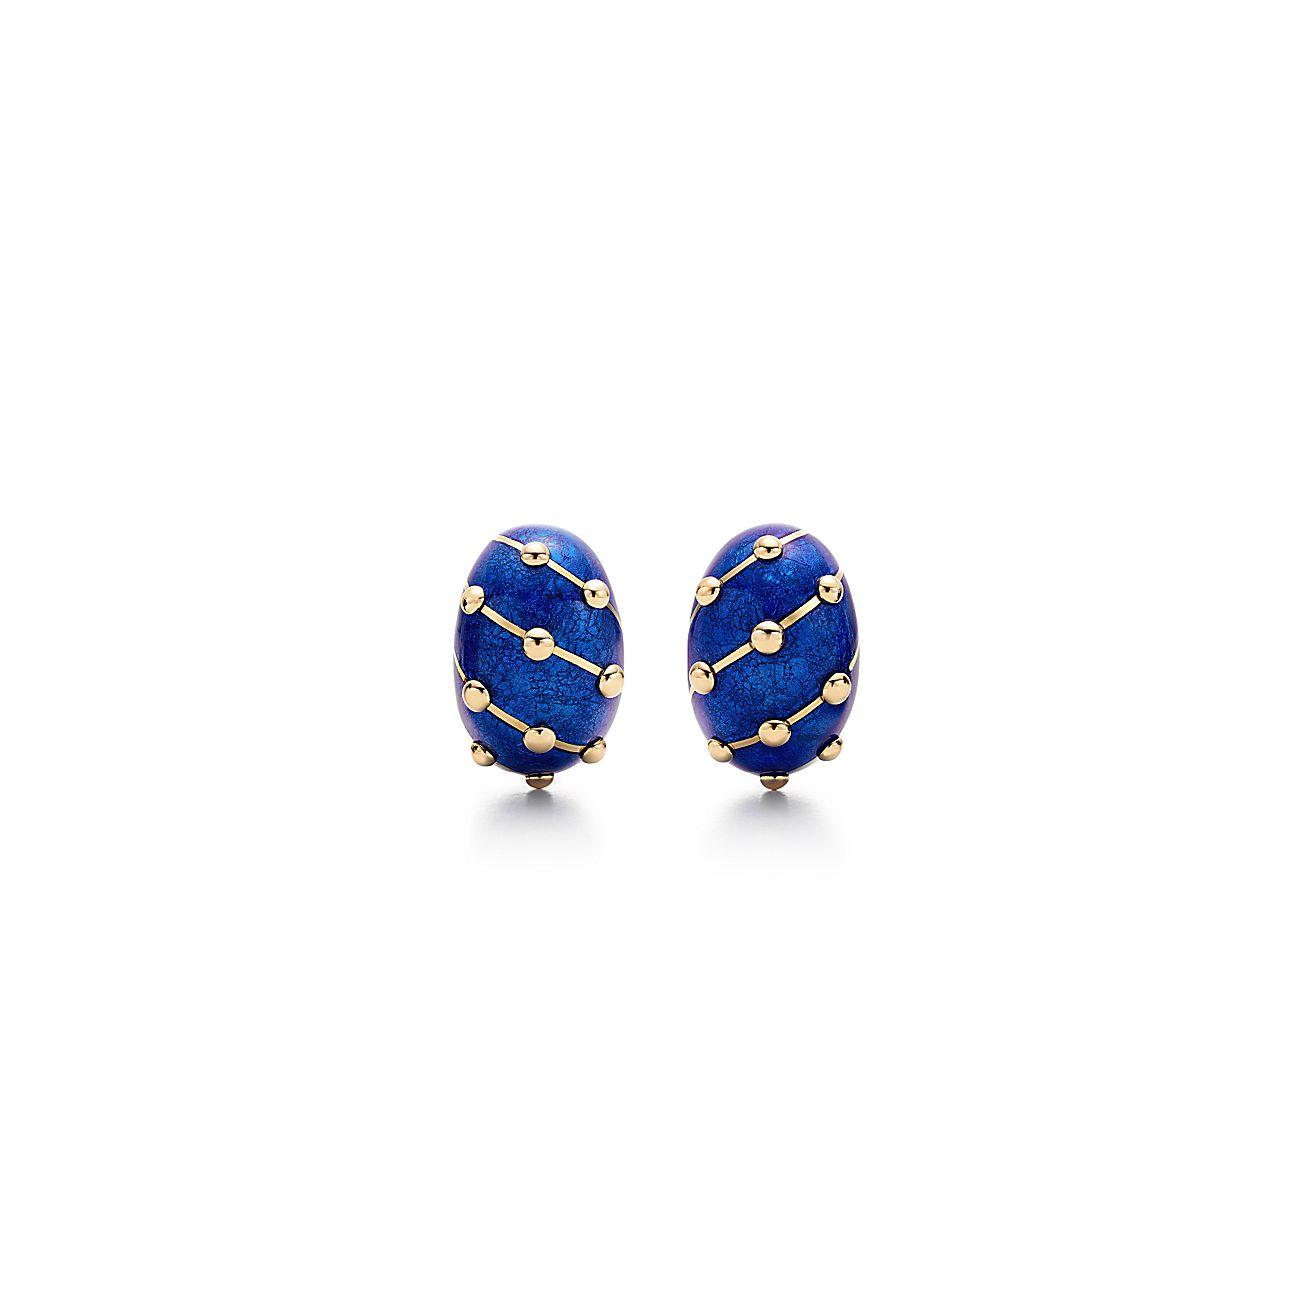 Tiffany & Co. Schlumberger®:Banana Earrings